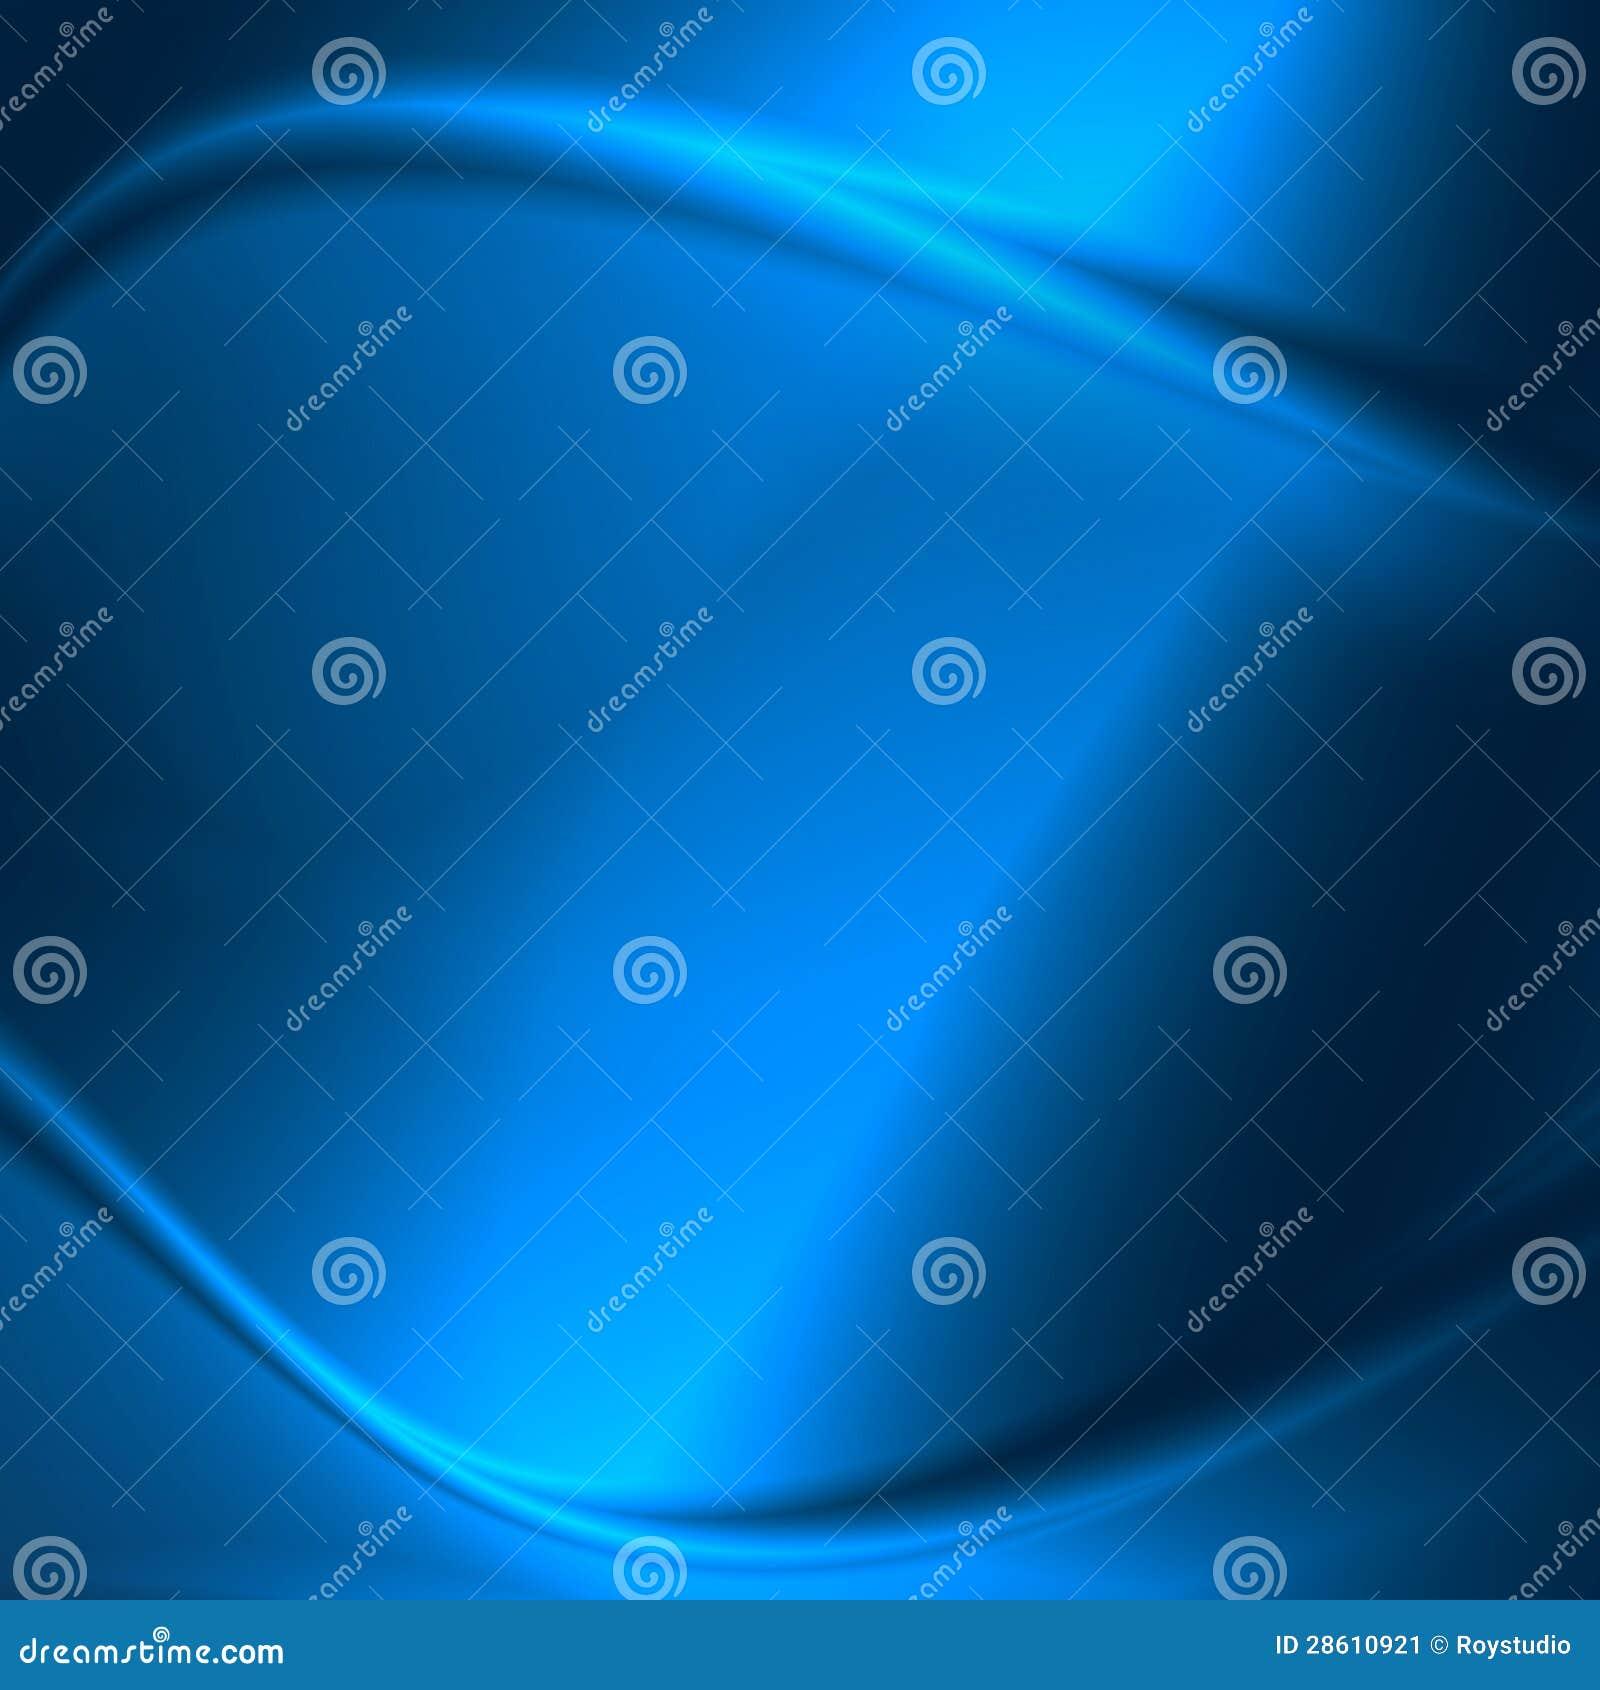 Blue abstract background subtle satin texture, gradient background